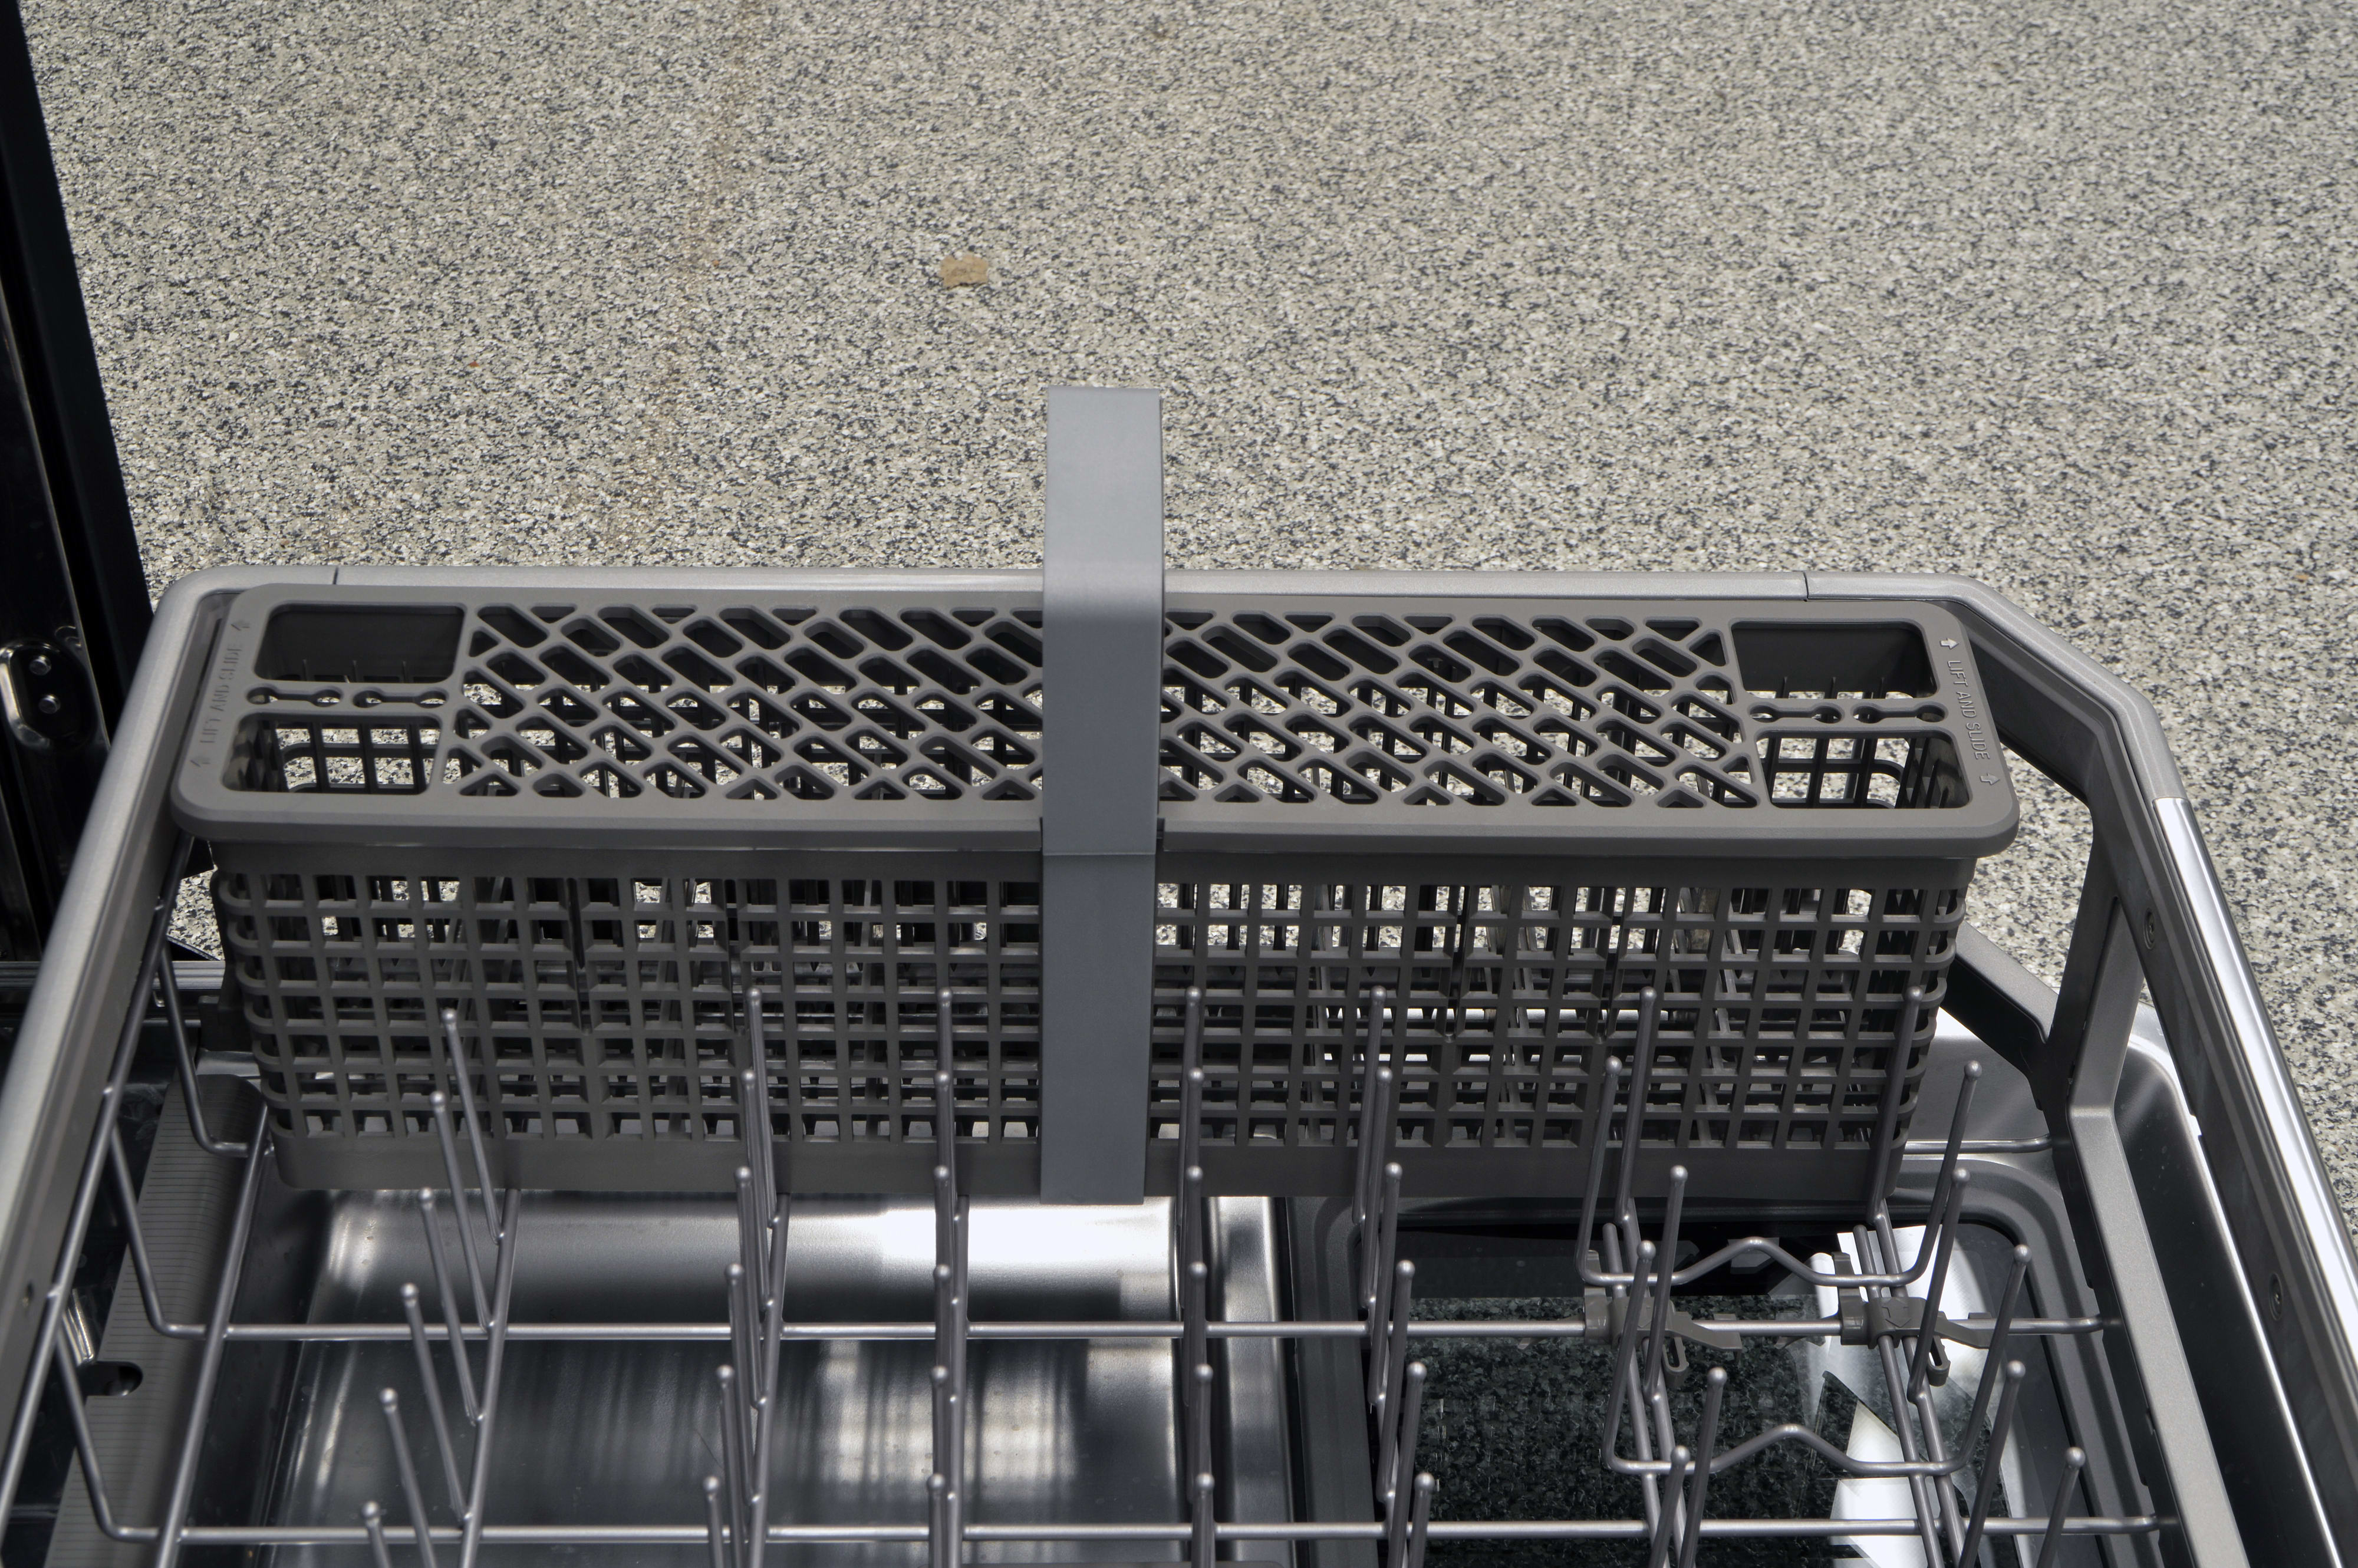 Cutlery basket in the lower rack